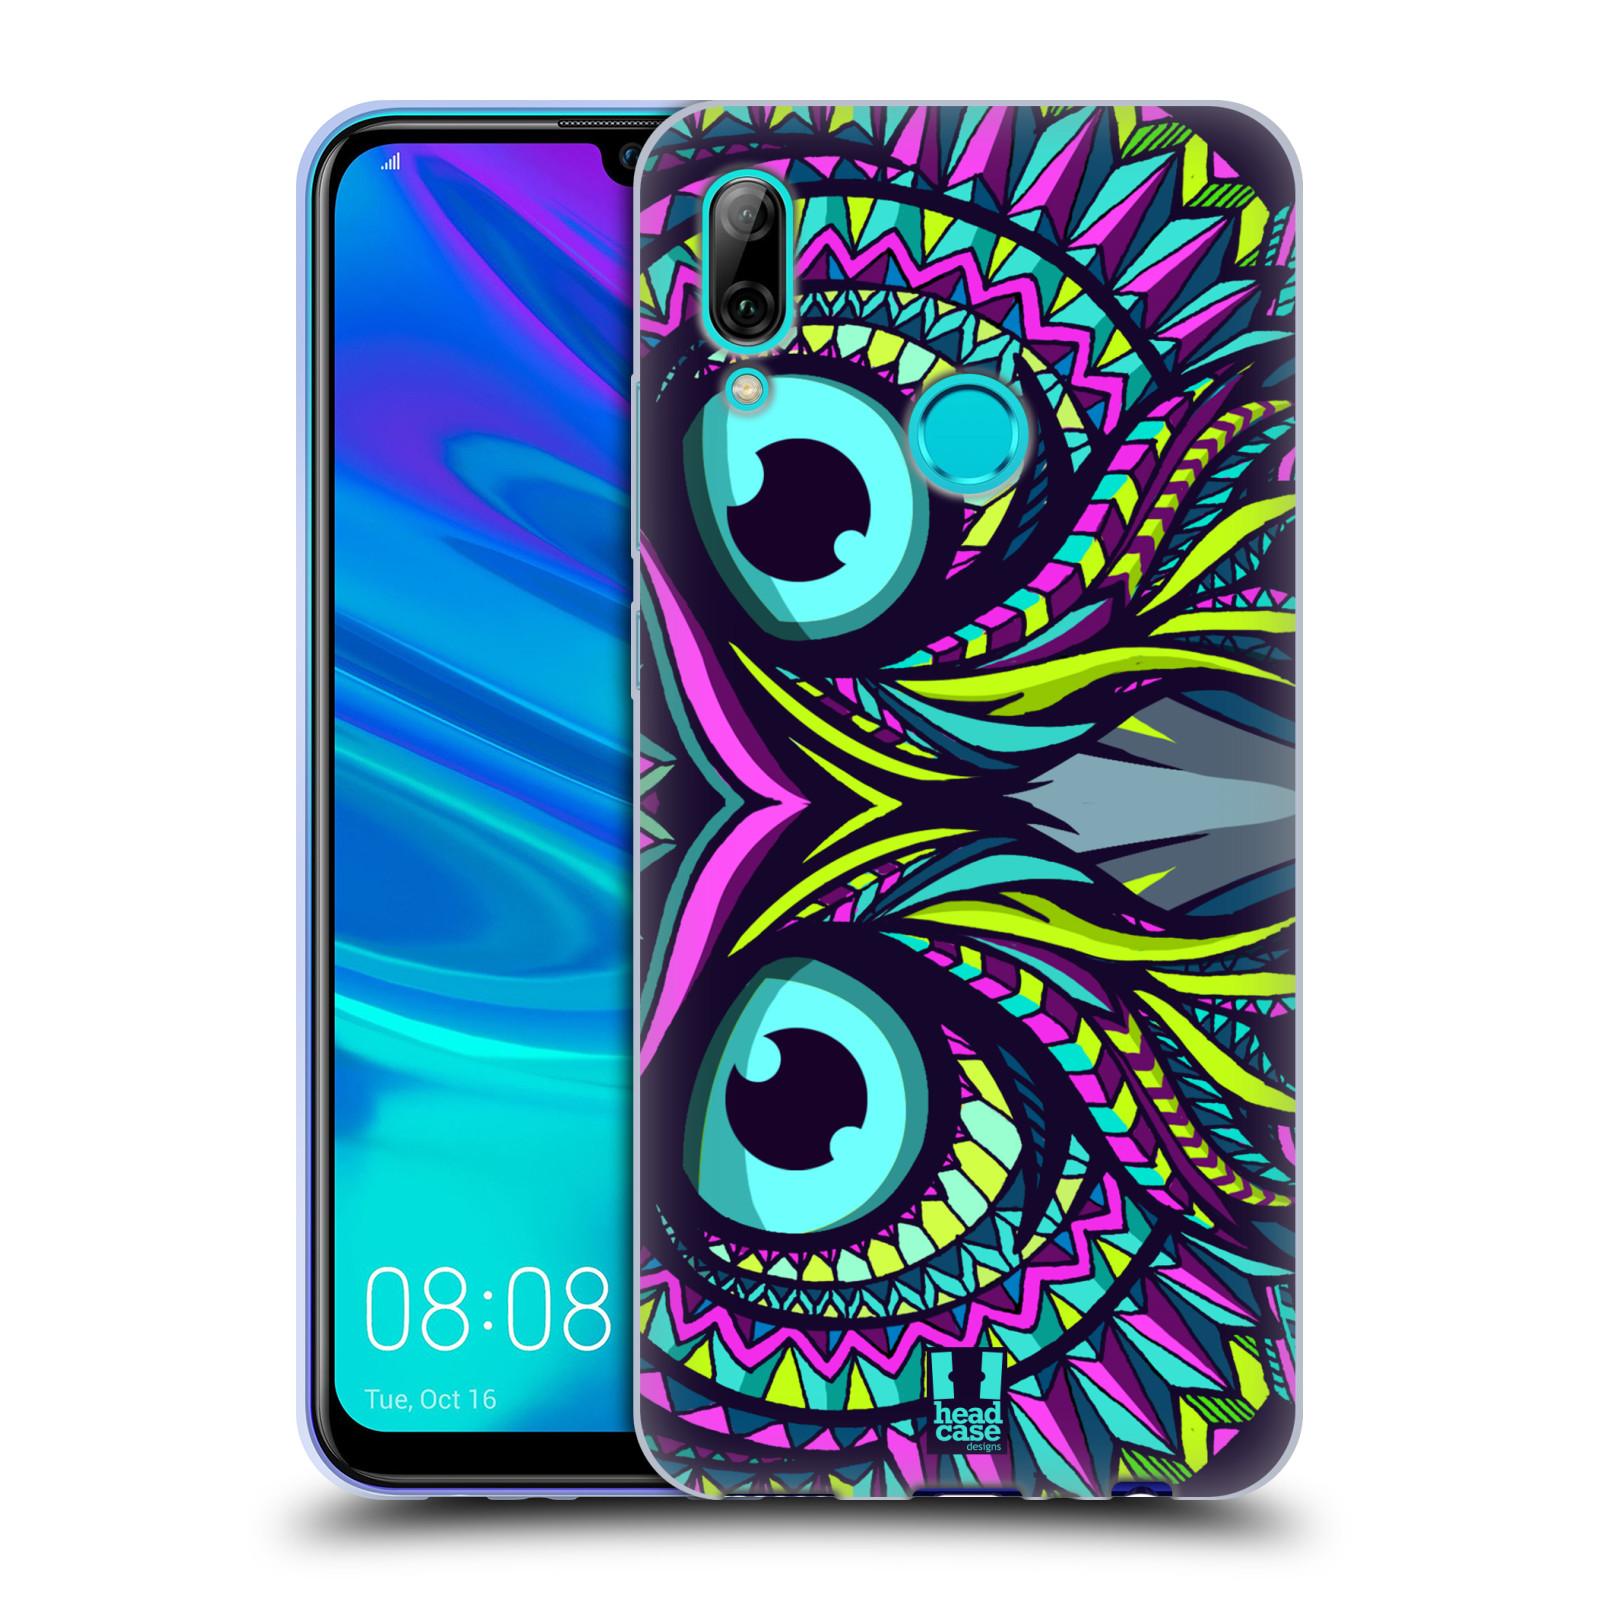 Silikonové pouzdro na mobil Huawei P Smart (2019) - Head Case - AZTEC SOVA